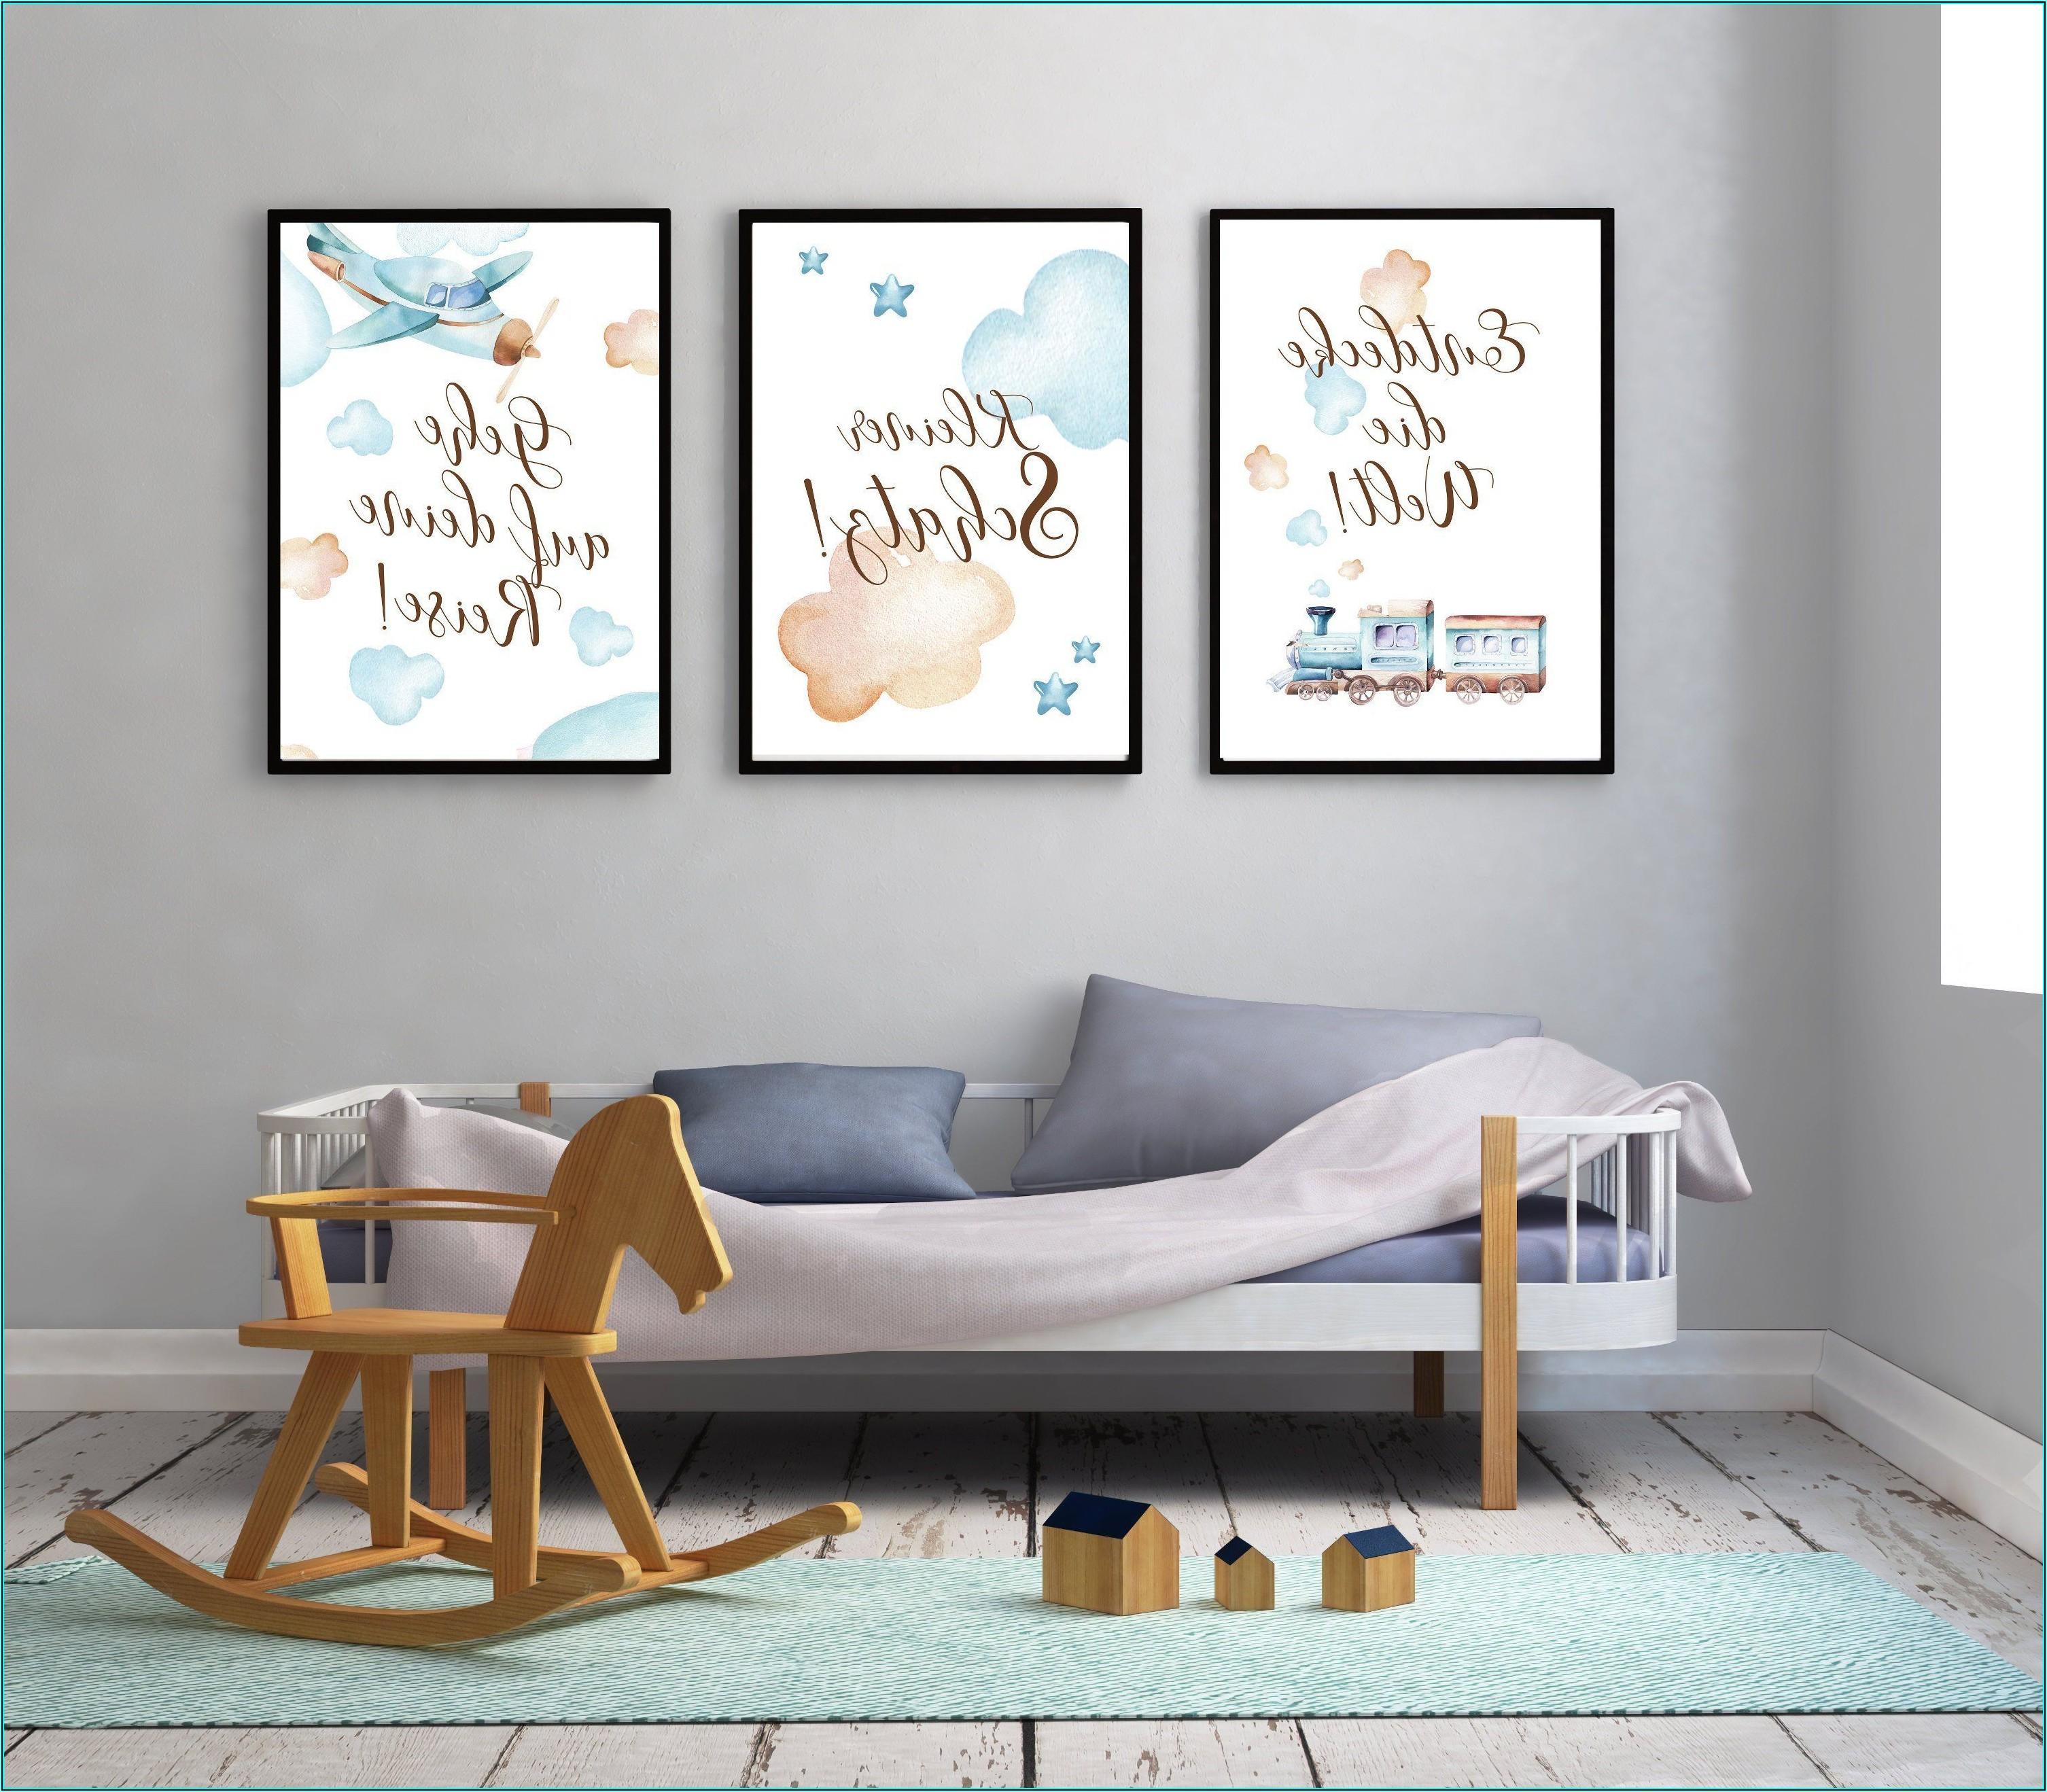 Wandbilder Kinderzimmer Junge